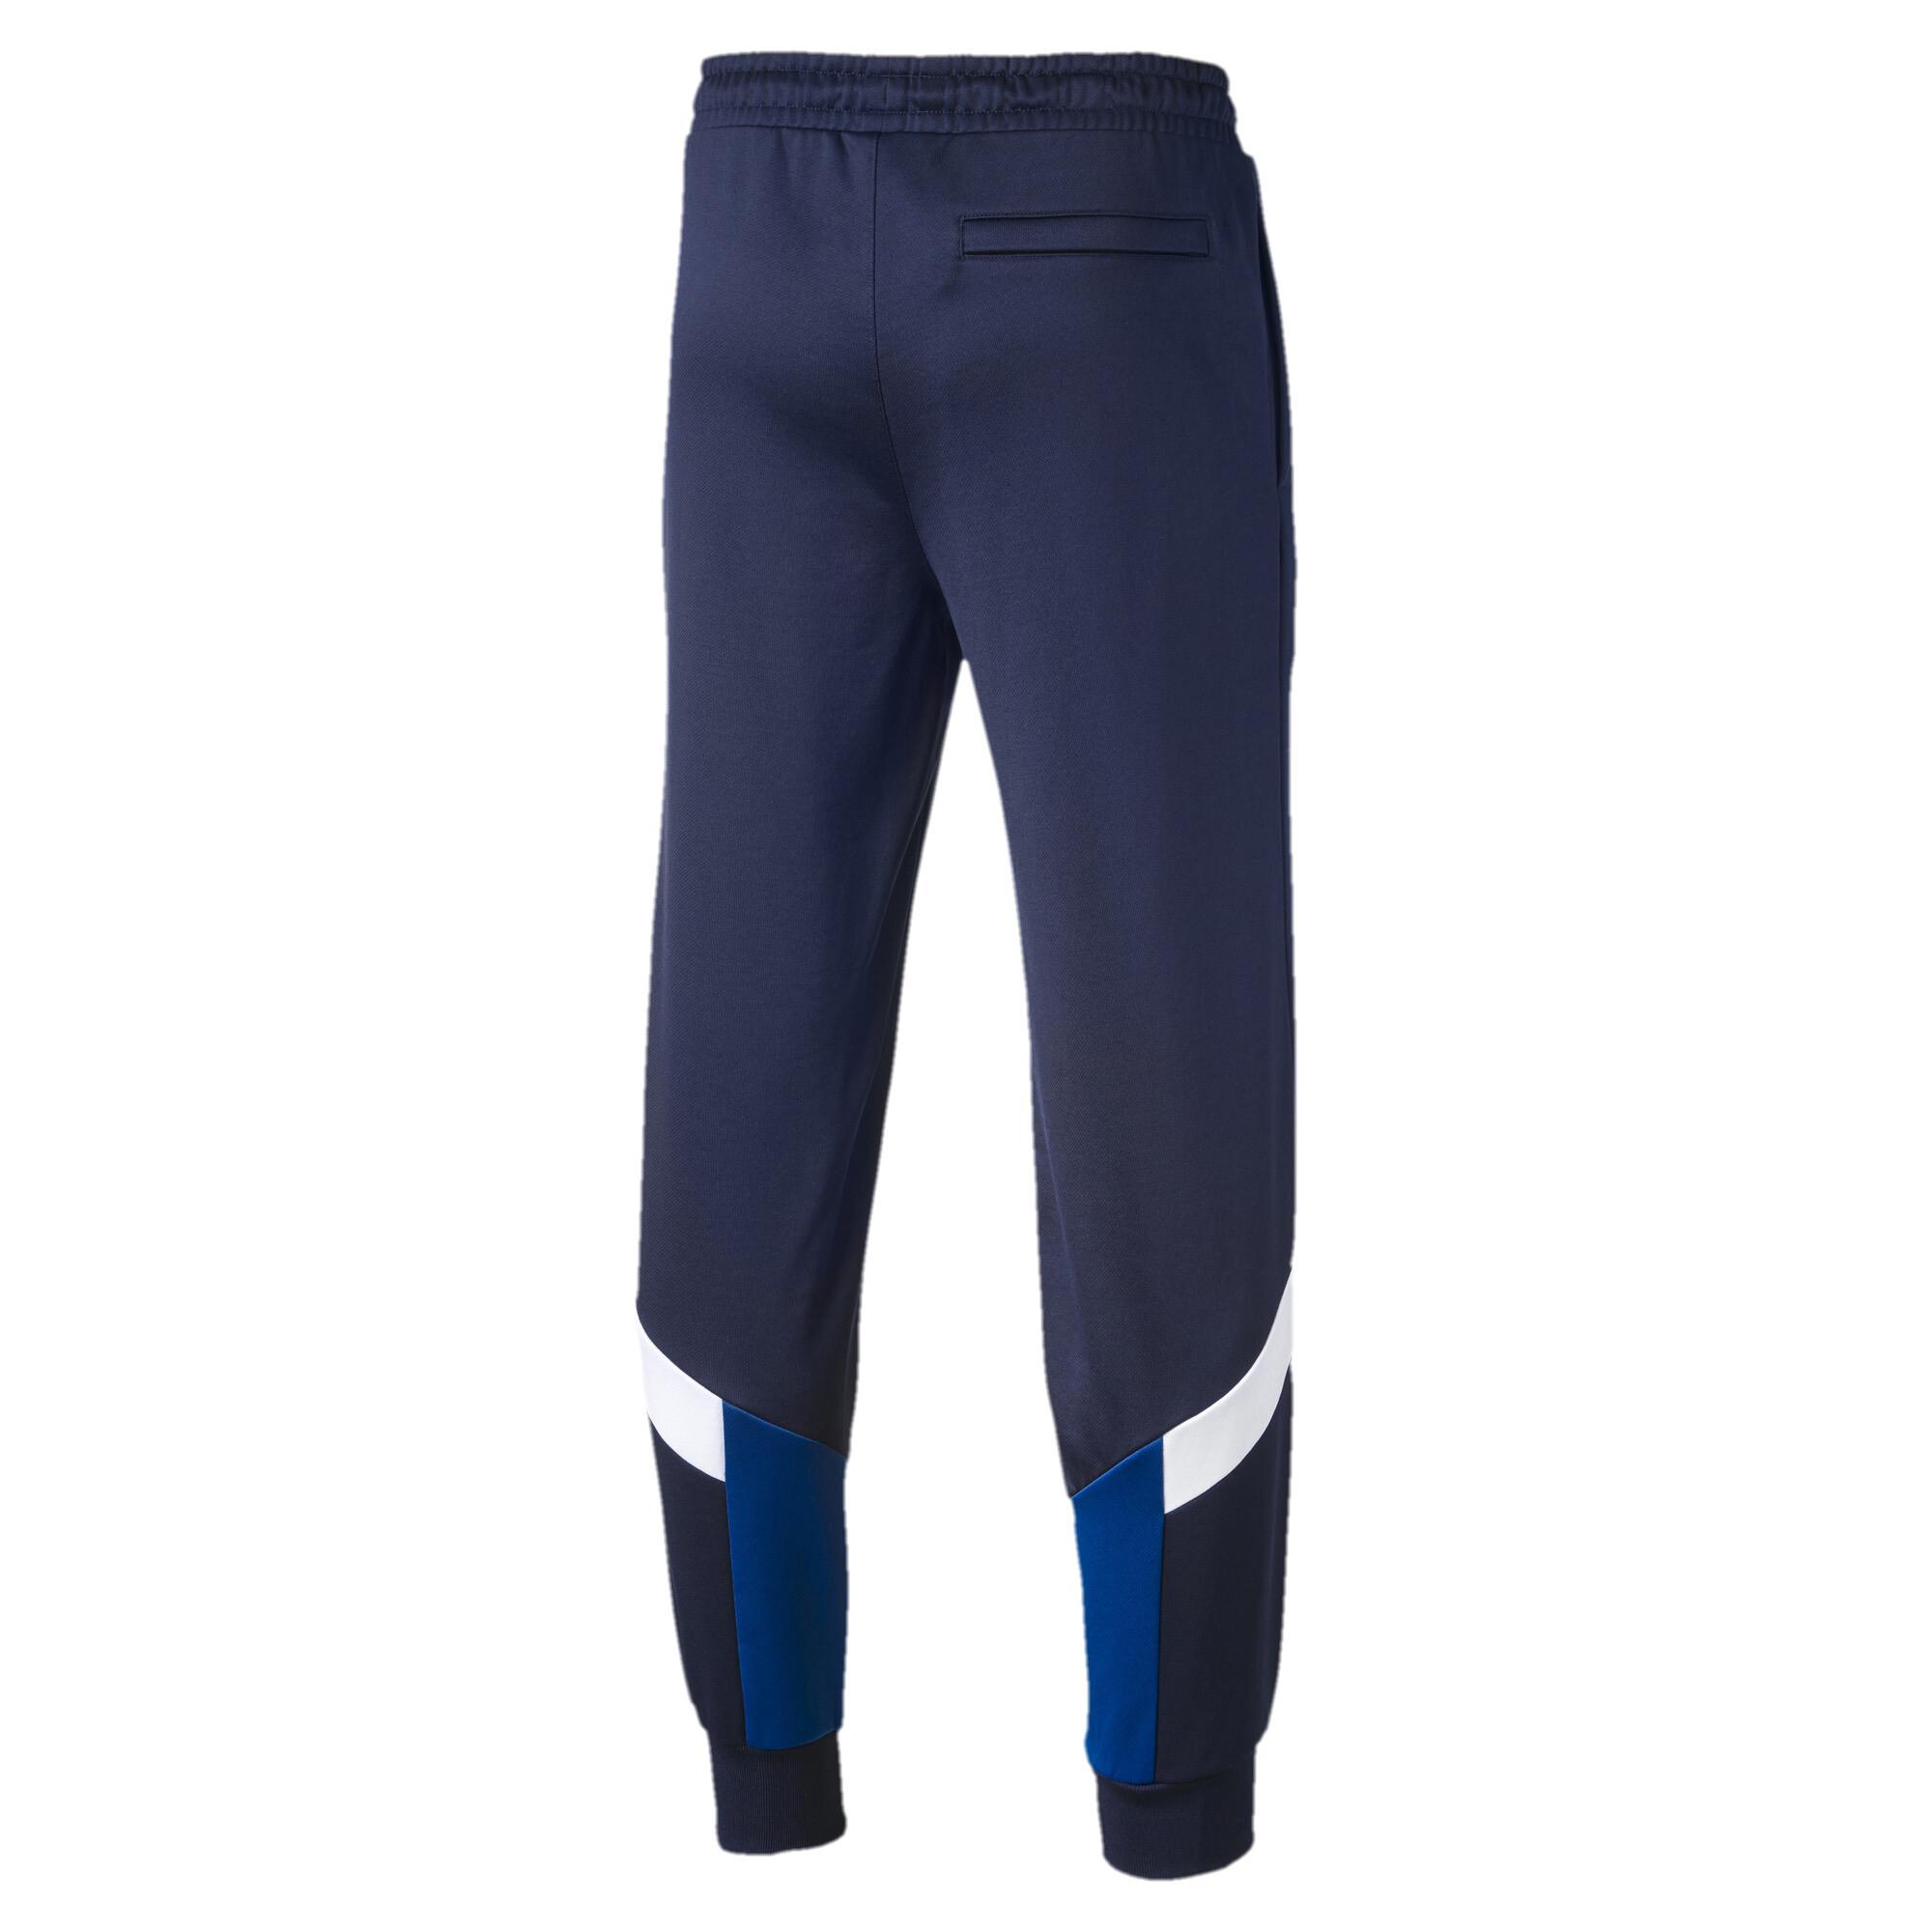 PUMA-Iconic-MCS-Men-039-s-Track-Pants-Men-Knitted-Pants-Sport-Classics thumbnail 19